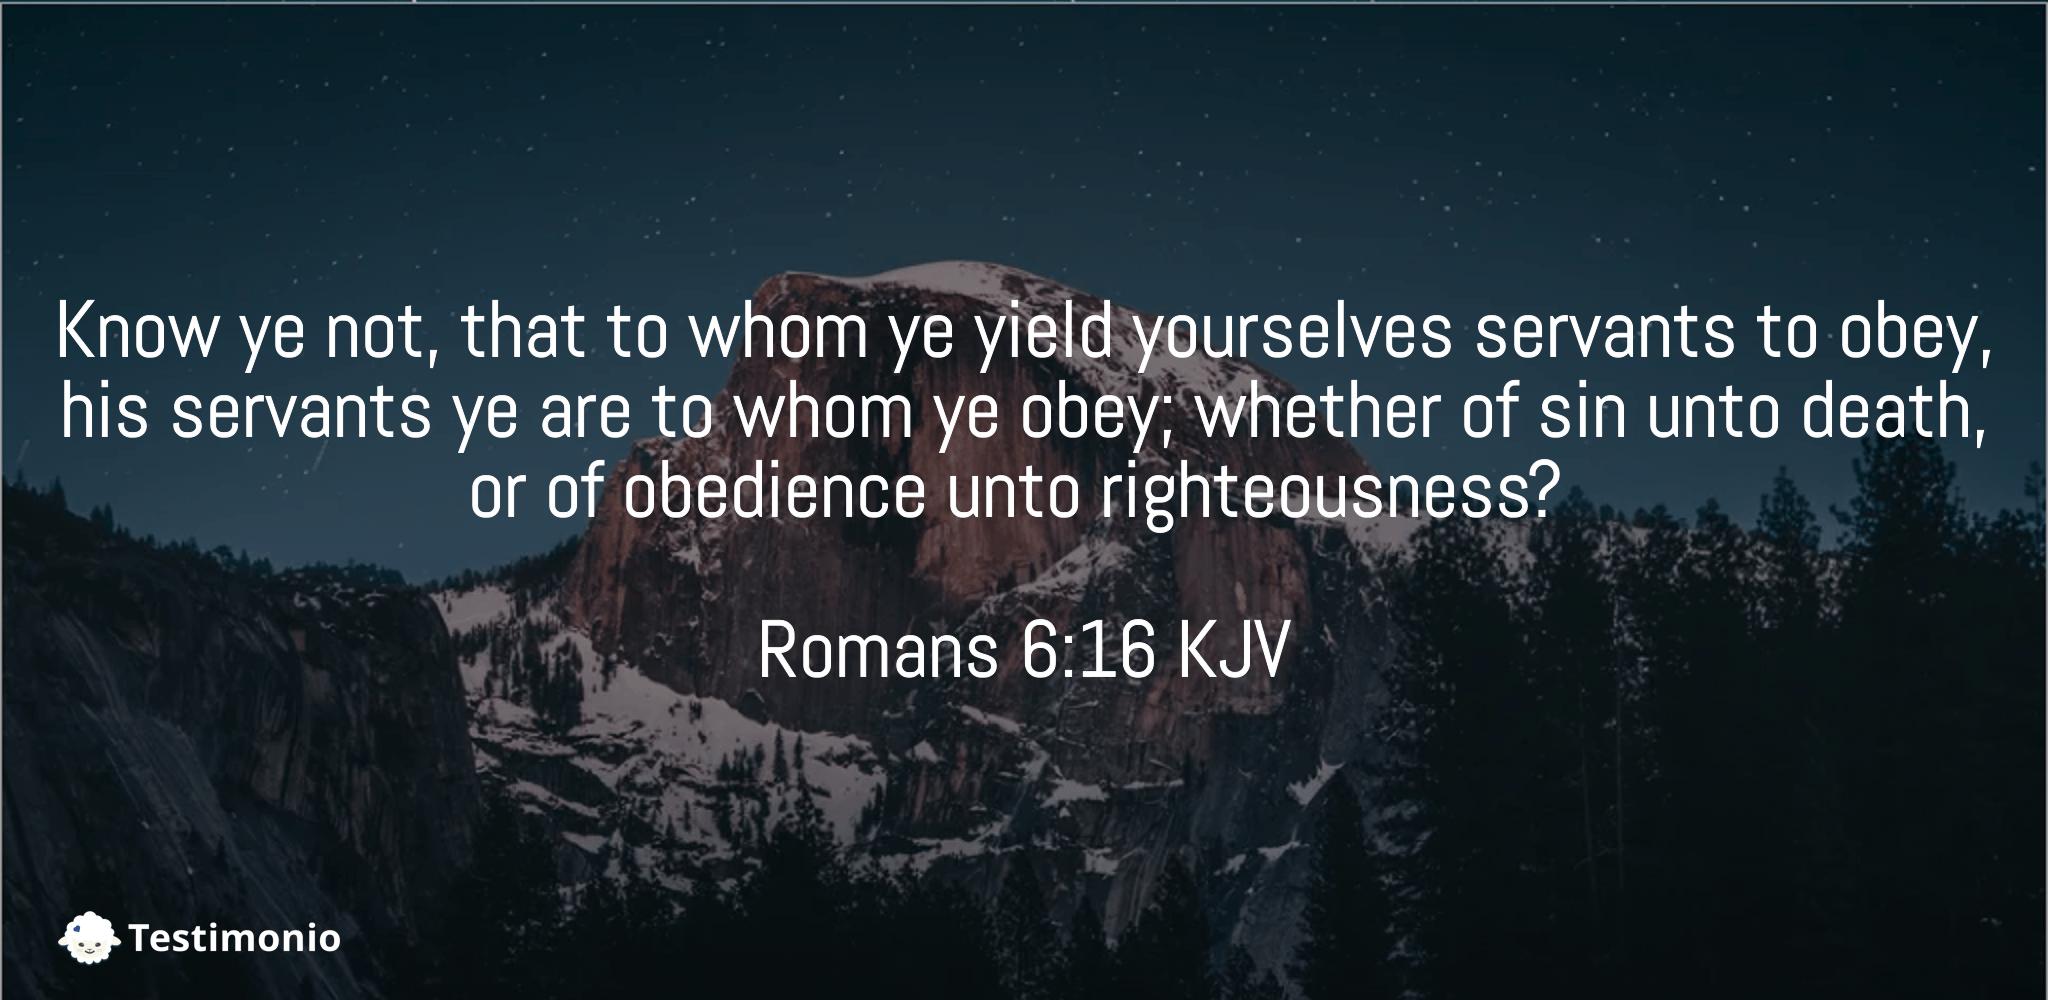 Romans 6:16